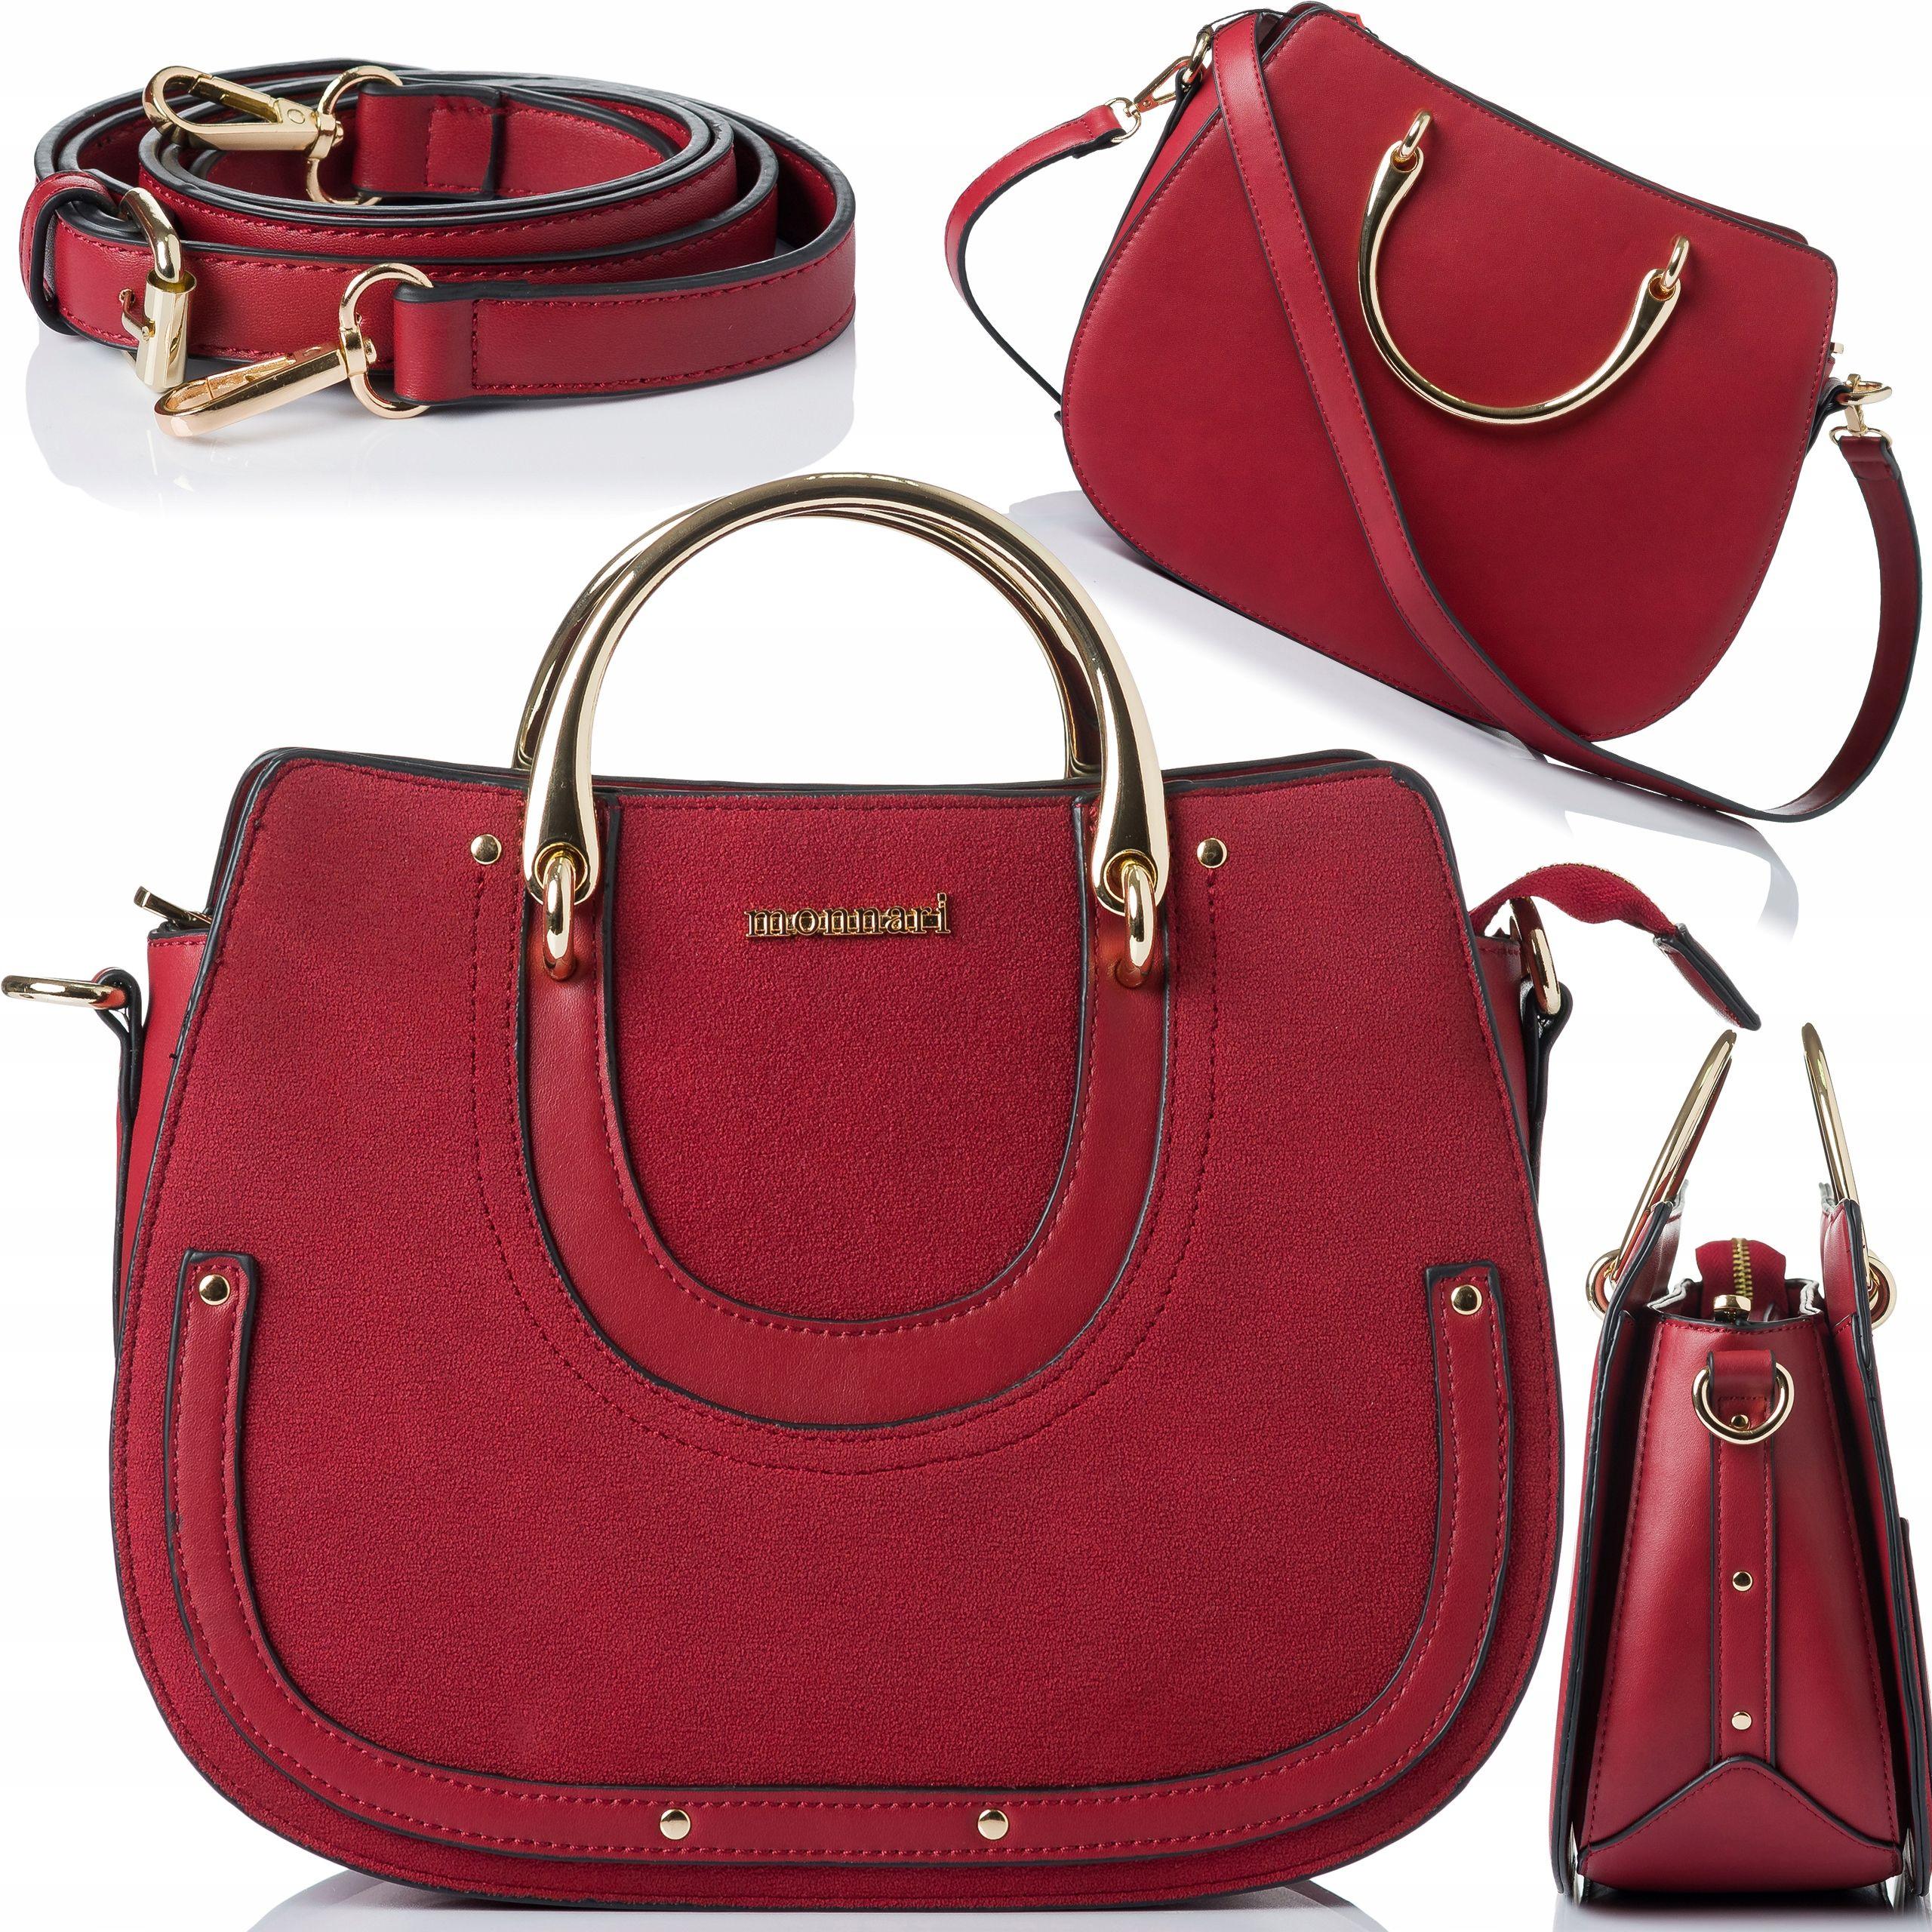 Torebka Na Ramie Listonoszka Monnari Stylowa 2019 7659578393 Oficjalne Archiwum Allegro Bags Top Handle Bag Accessories